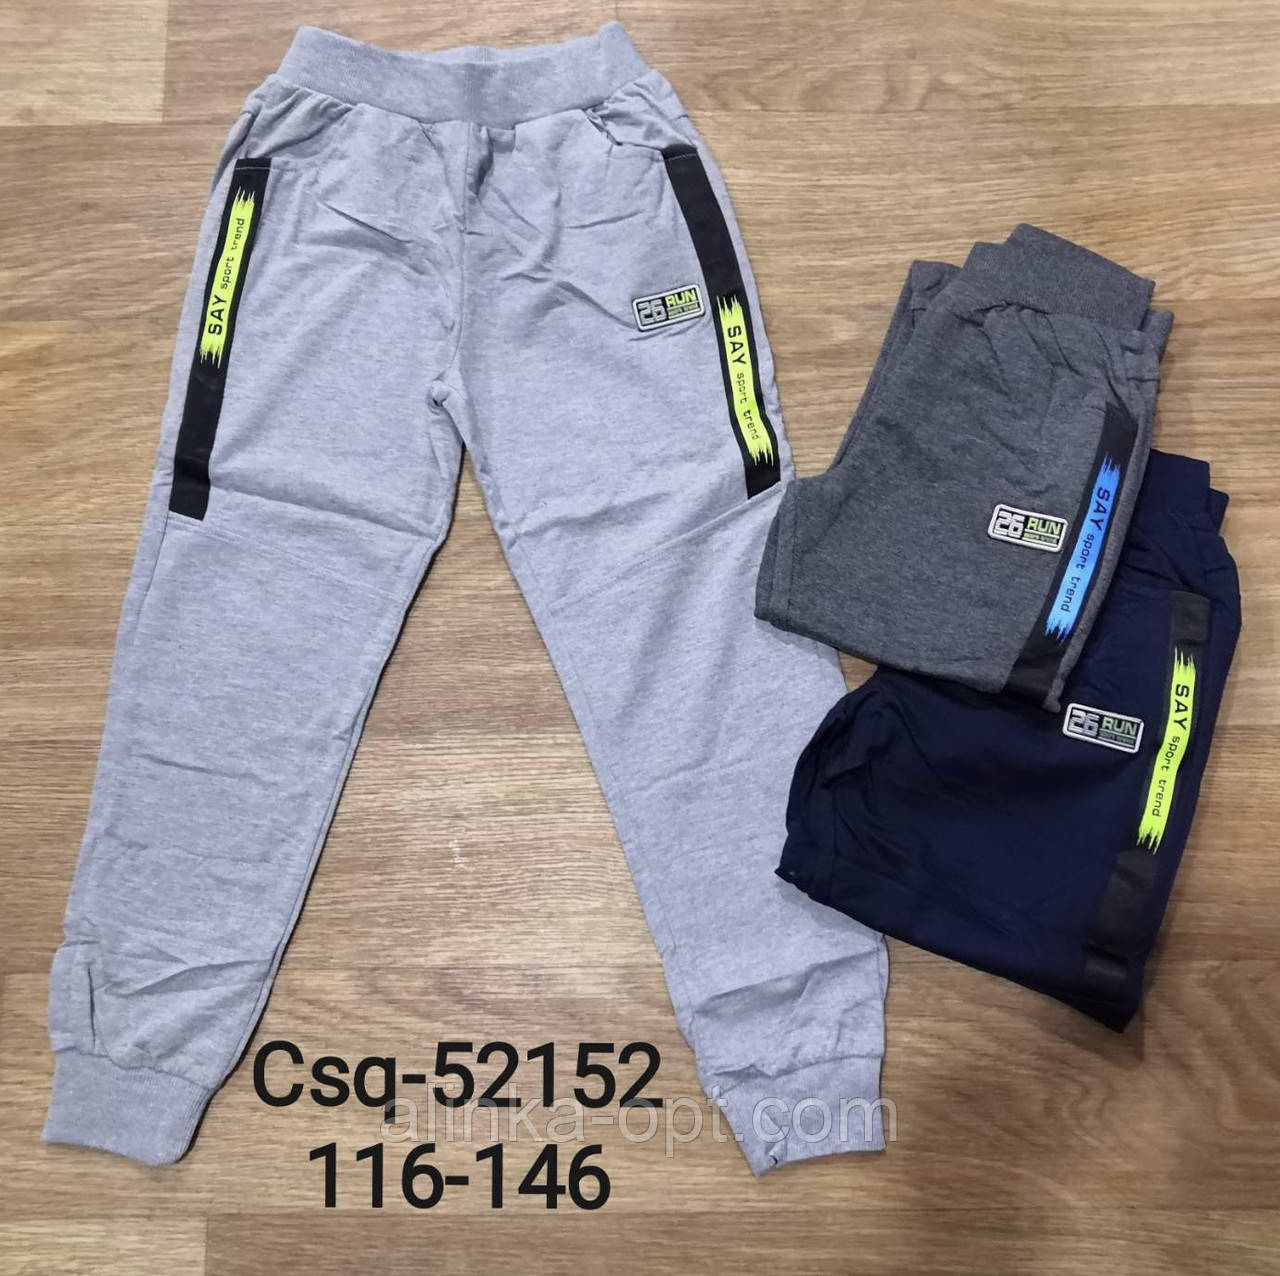 Спортивные брюки для мальчиков Mr. David ,  116-146 рр. Артикул: CSQ52152